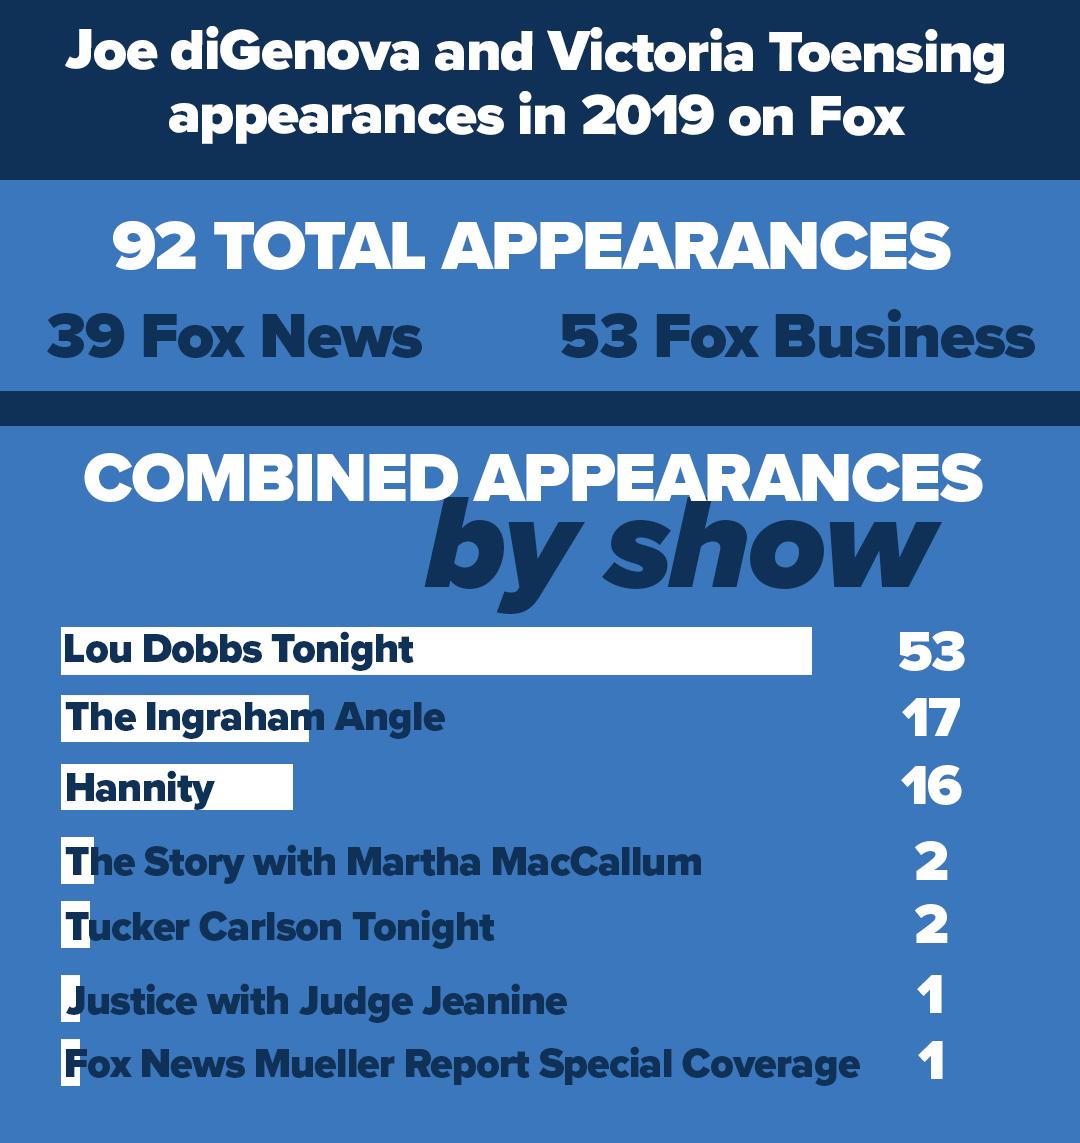 Joe diGenova and Victoria Toensing appearances in 2019 on Fox